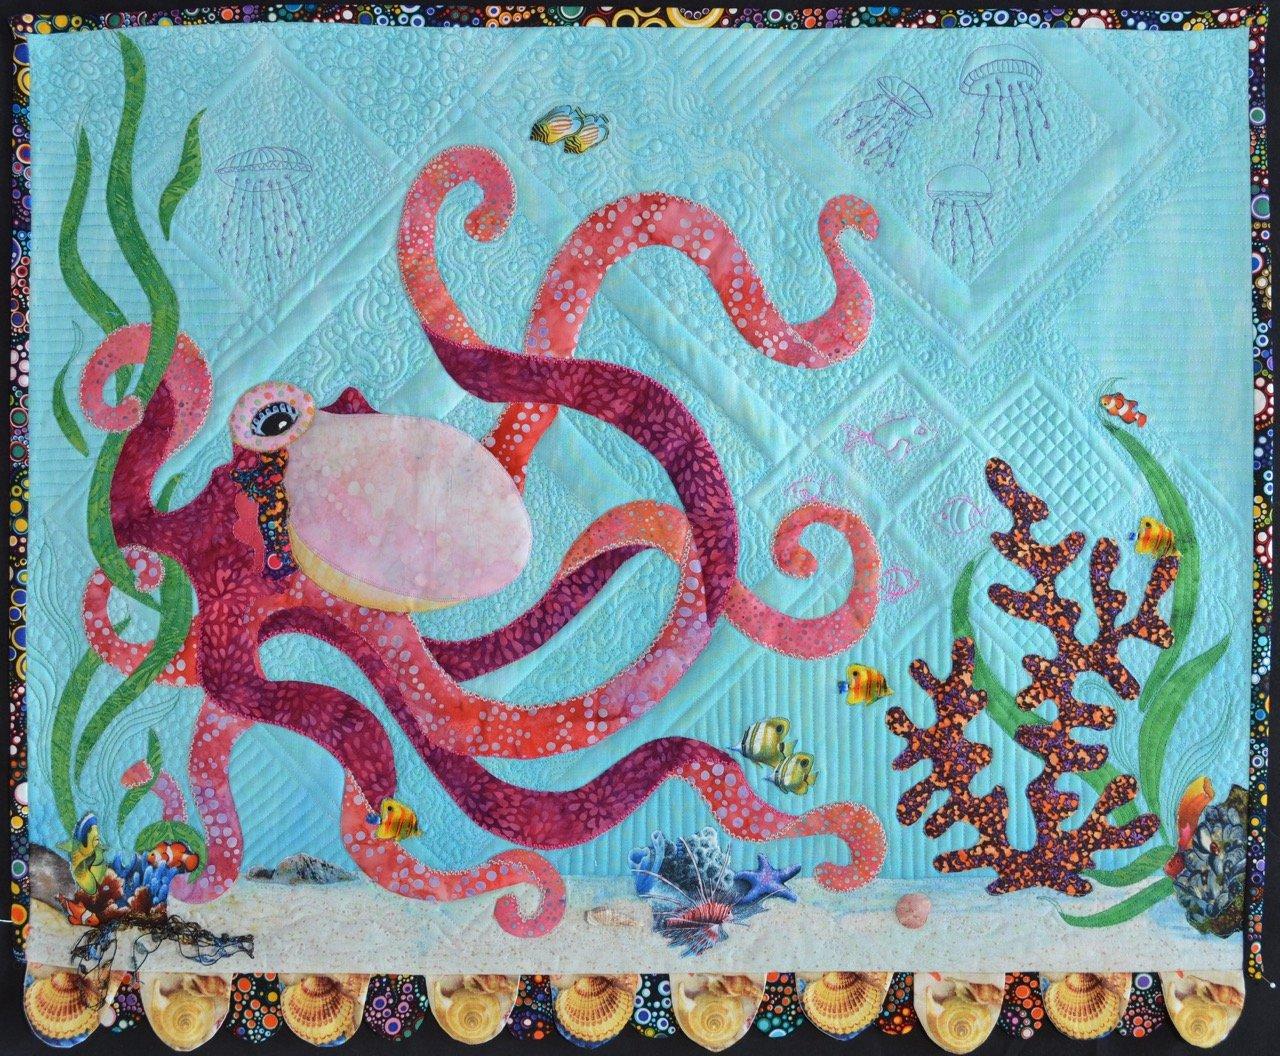 Octopus Garden pattern